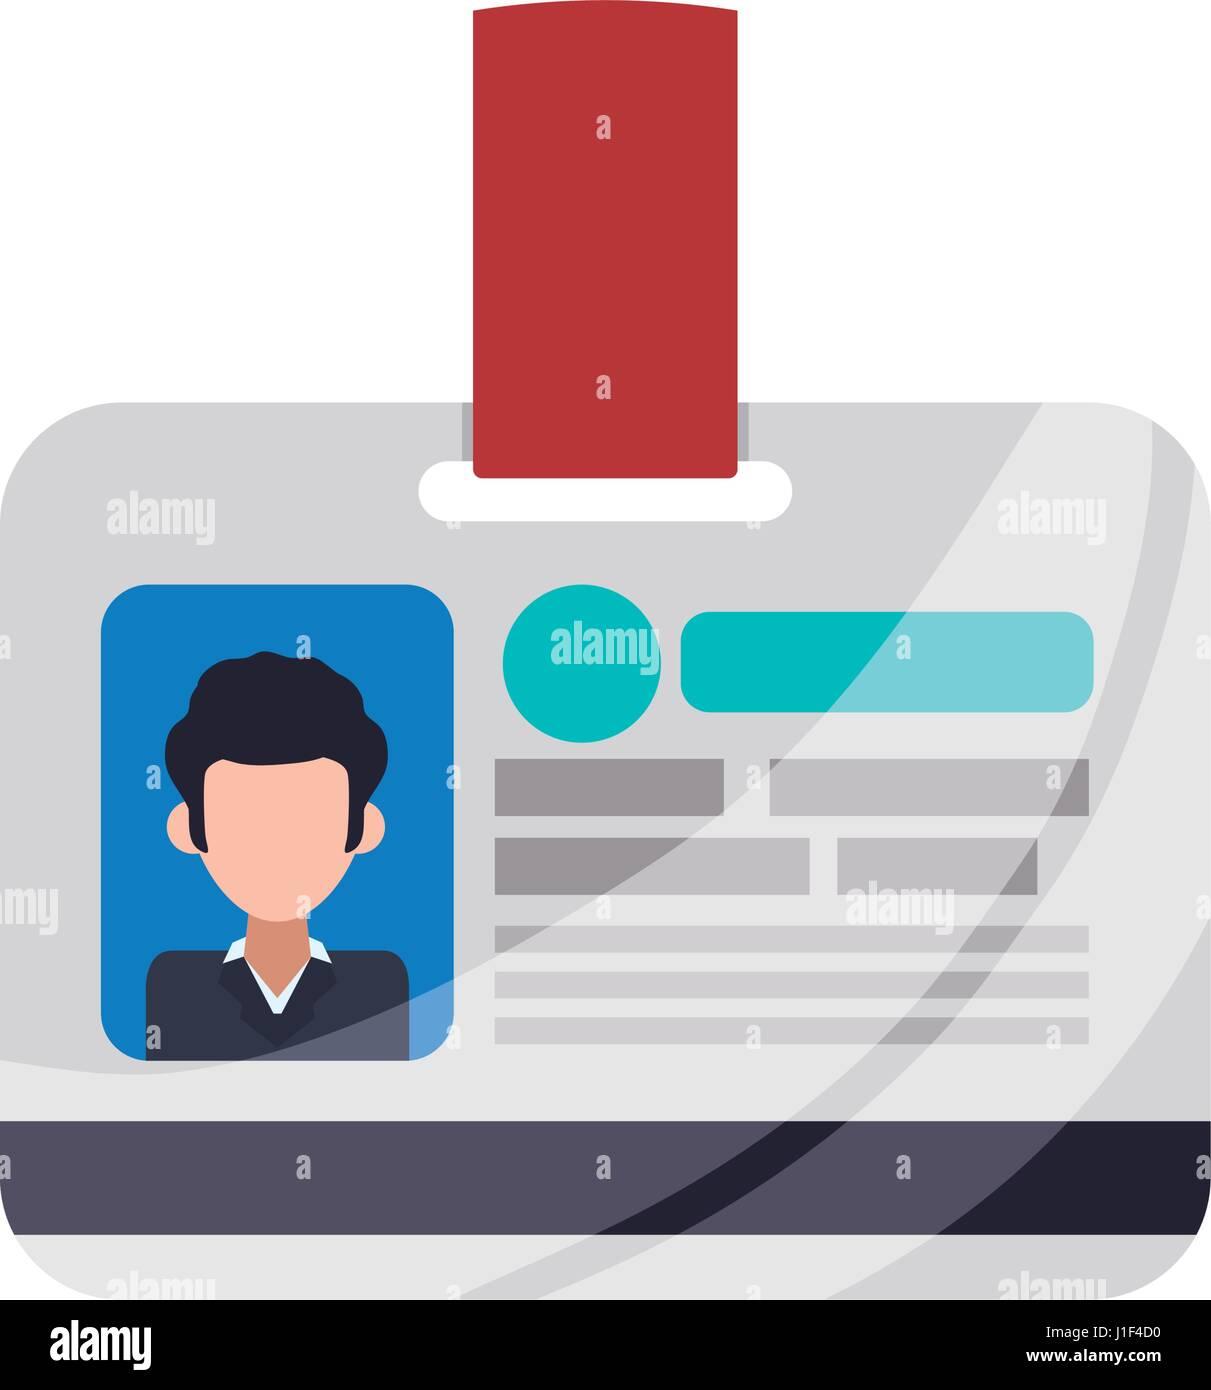 Employee Id Card Stock Vector Art Illustration Vector Image - Employee id card